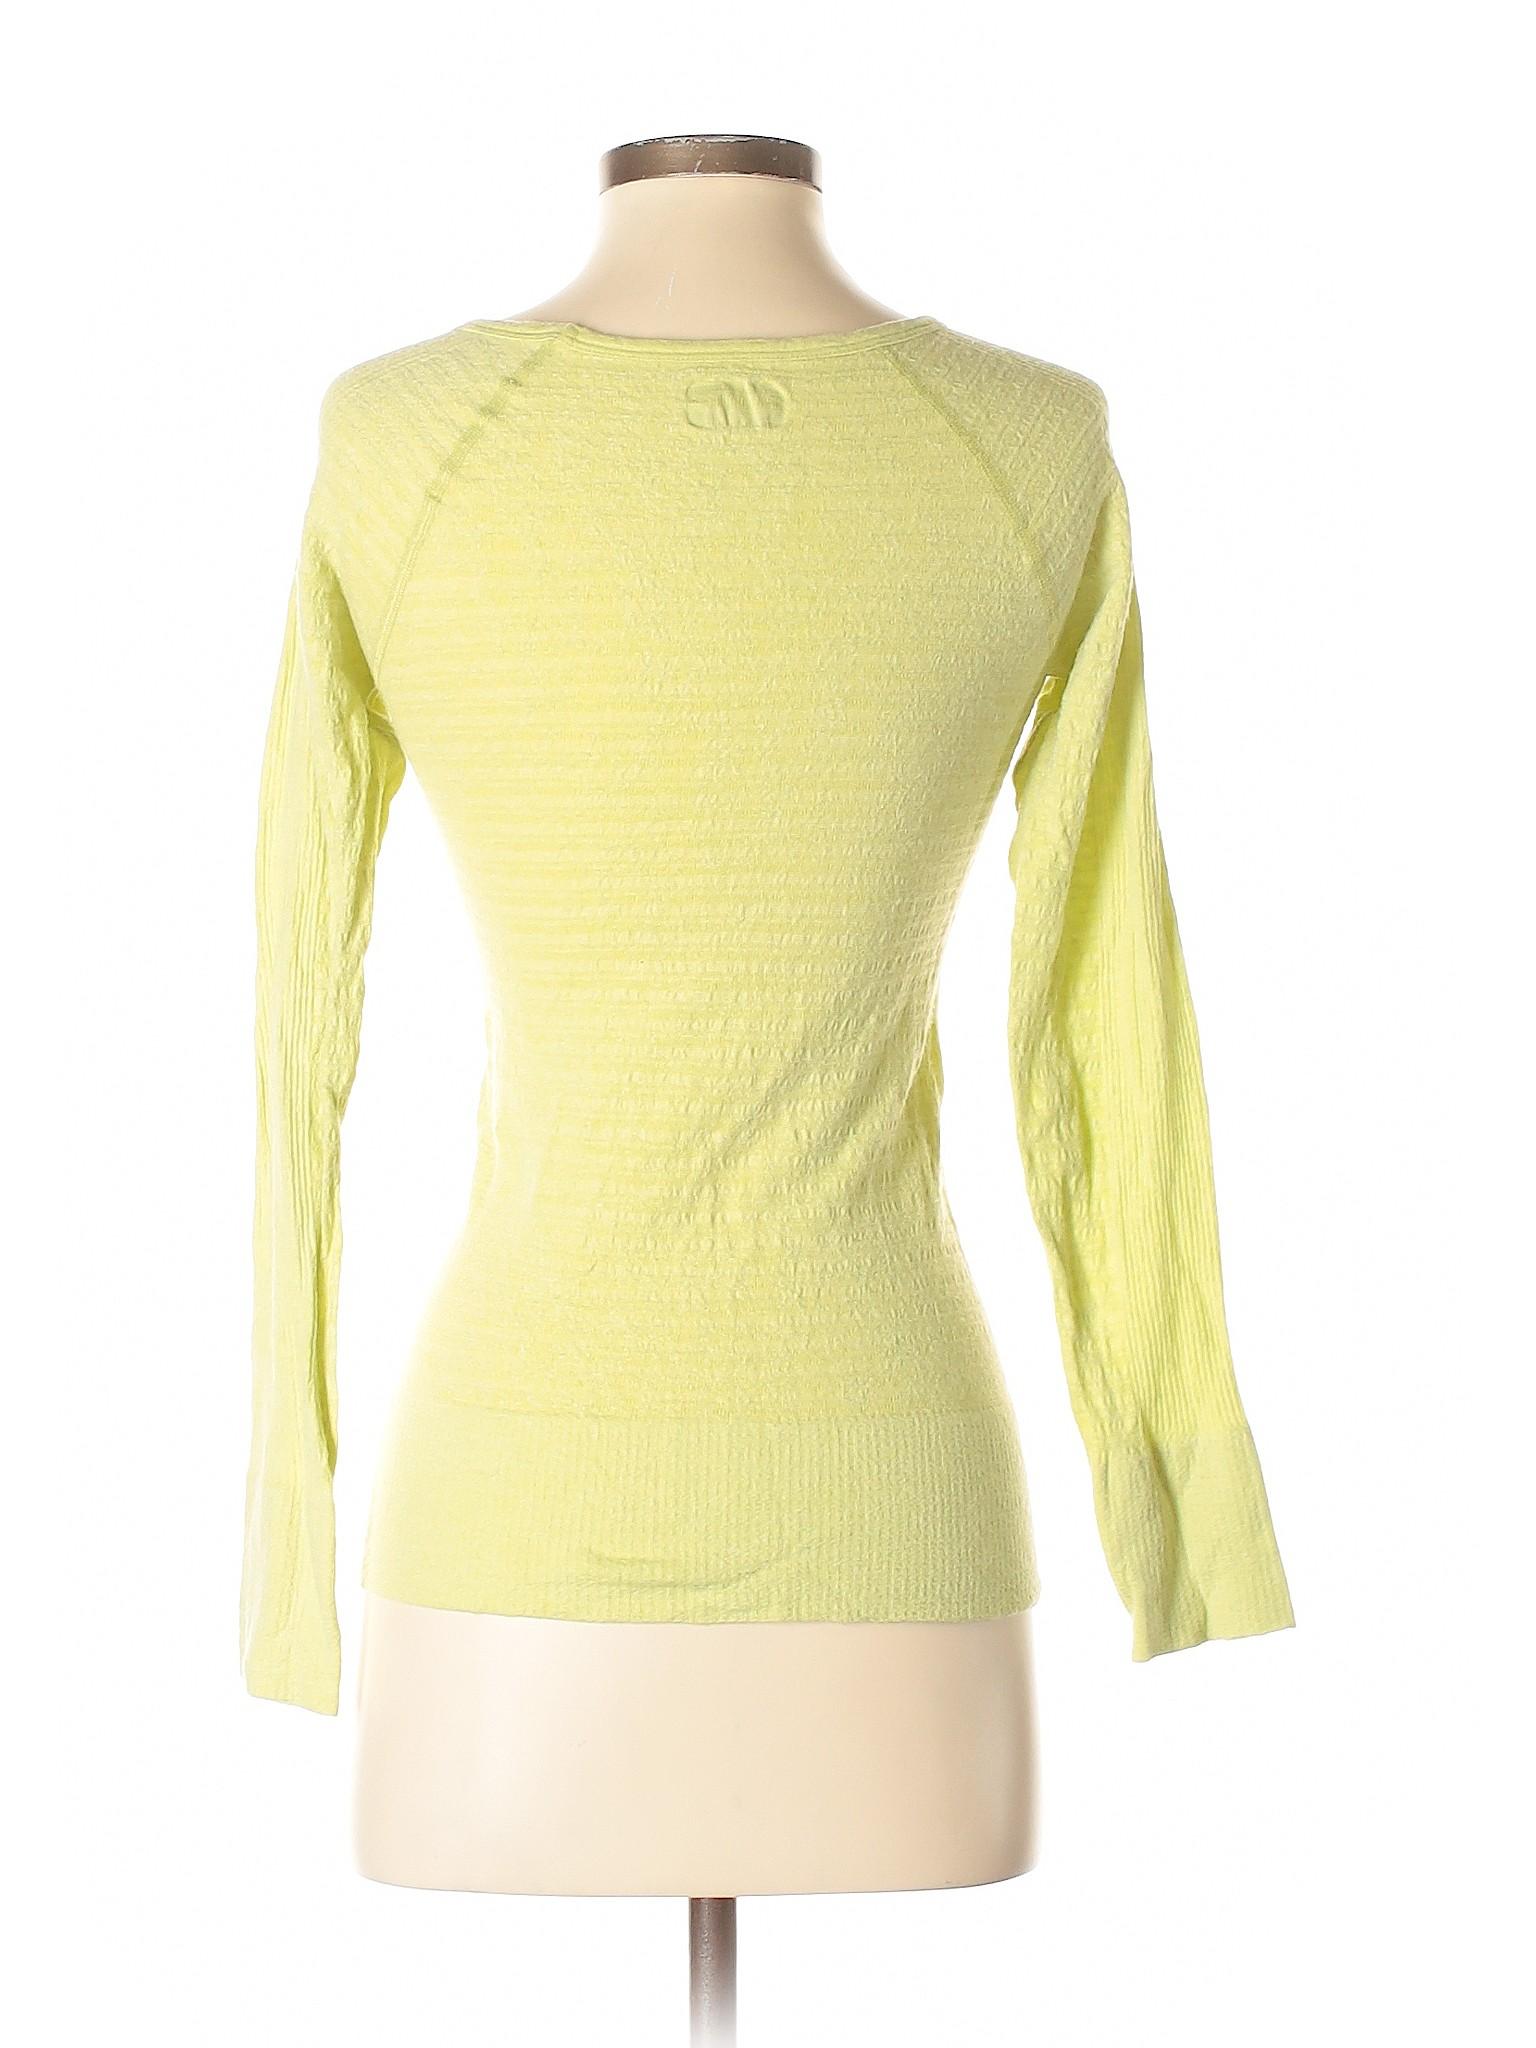 Sweater Boutique Athleta Sweater Sweater Wool Pullover Wool Boutique Athleta Pullover Boutique Pullover Boutique Athleta Wool 6ag6w